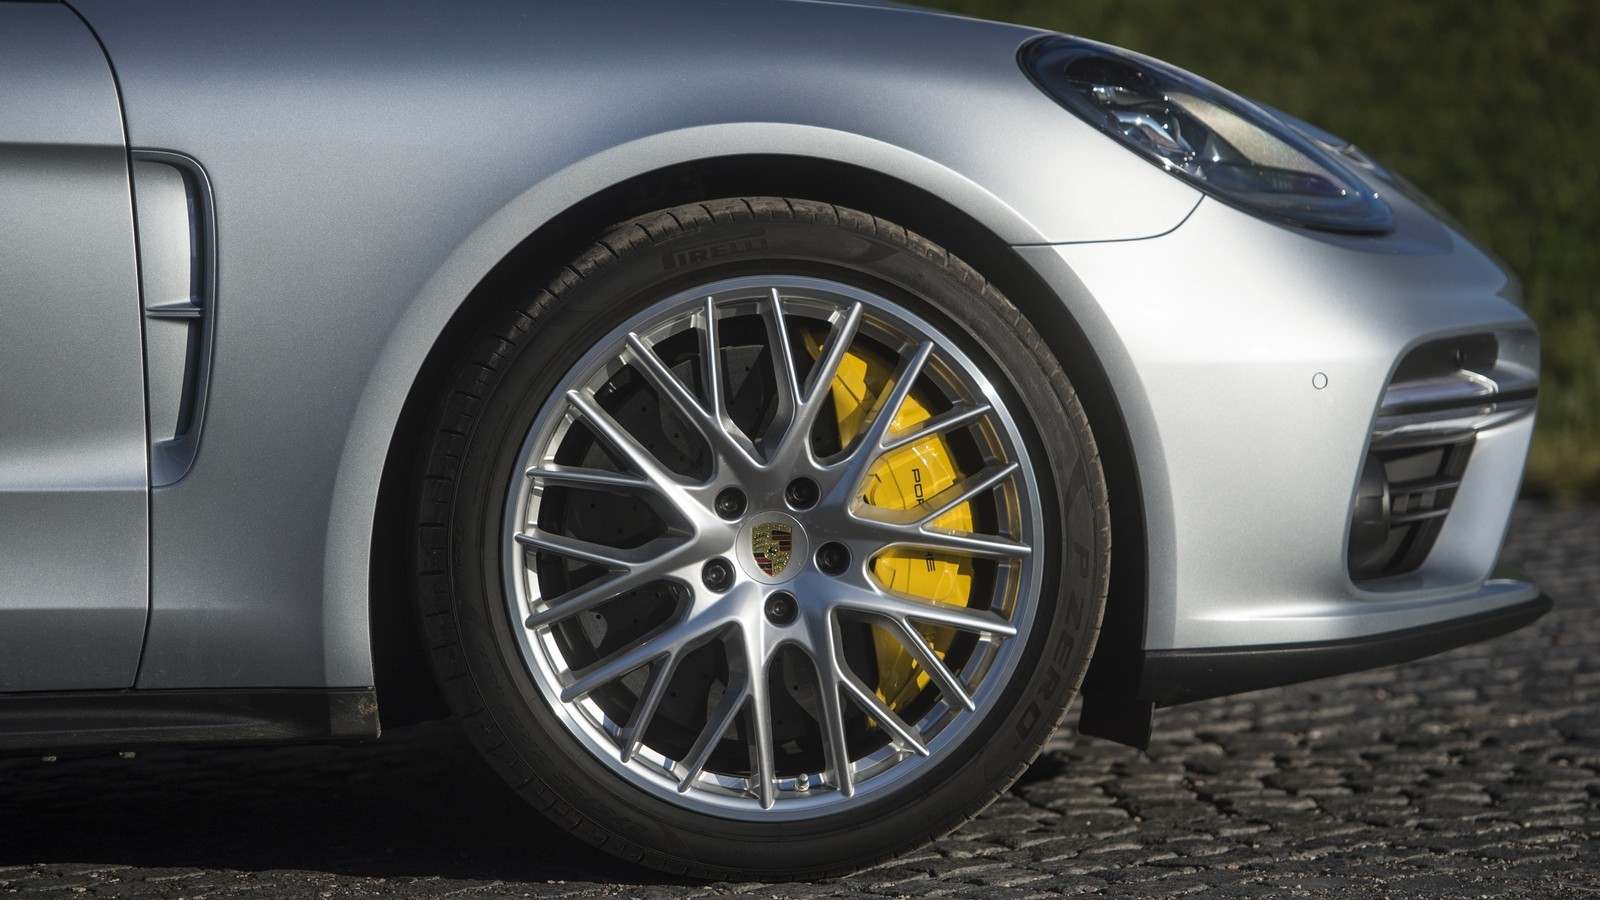 New_Porsche_Panamera_2016_DSD1405.orig